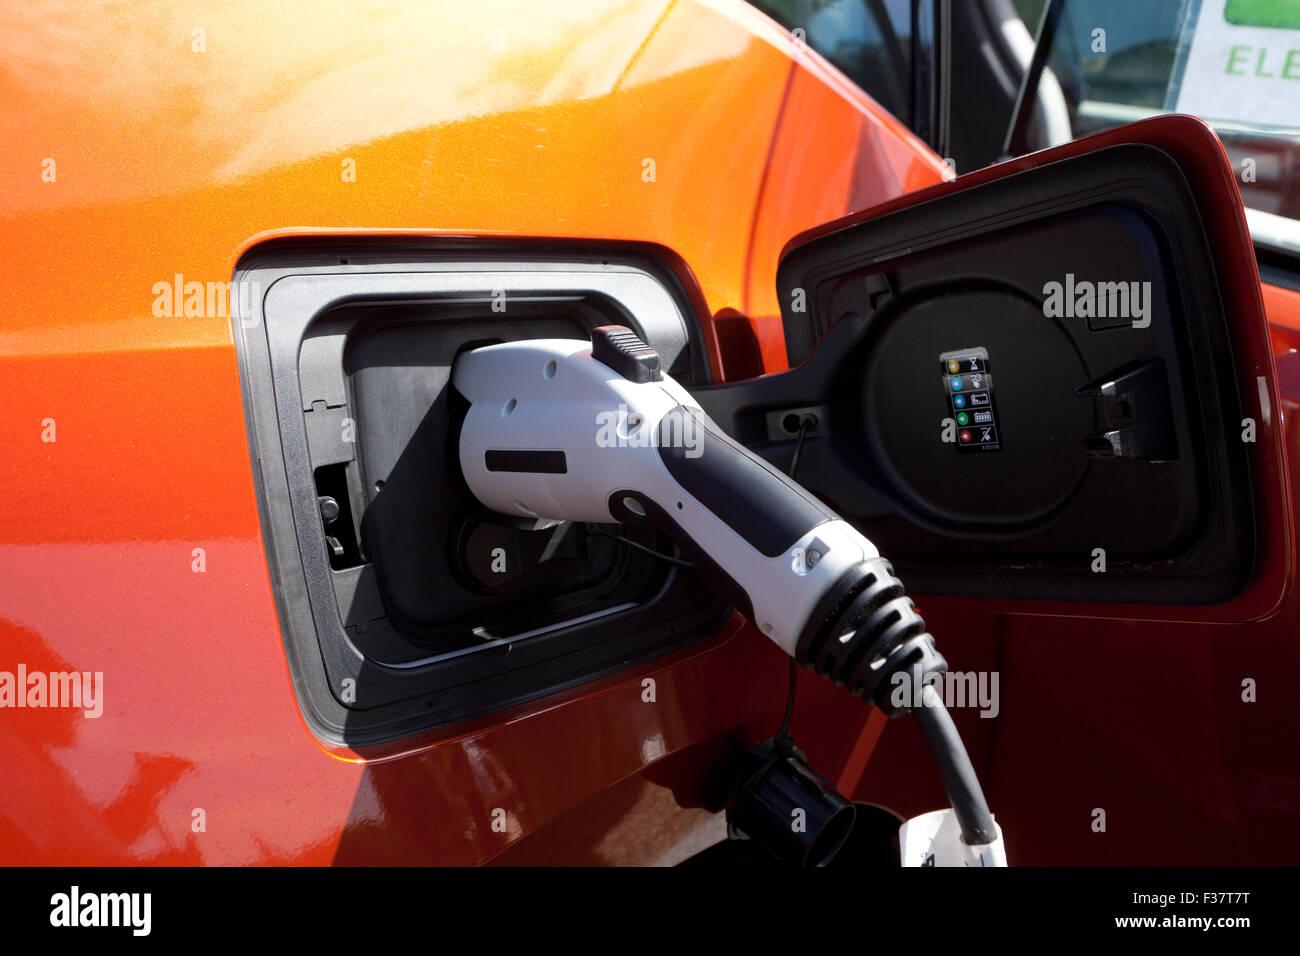 Carga de coches eléctricos - EE.UU. Imagen De Stock